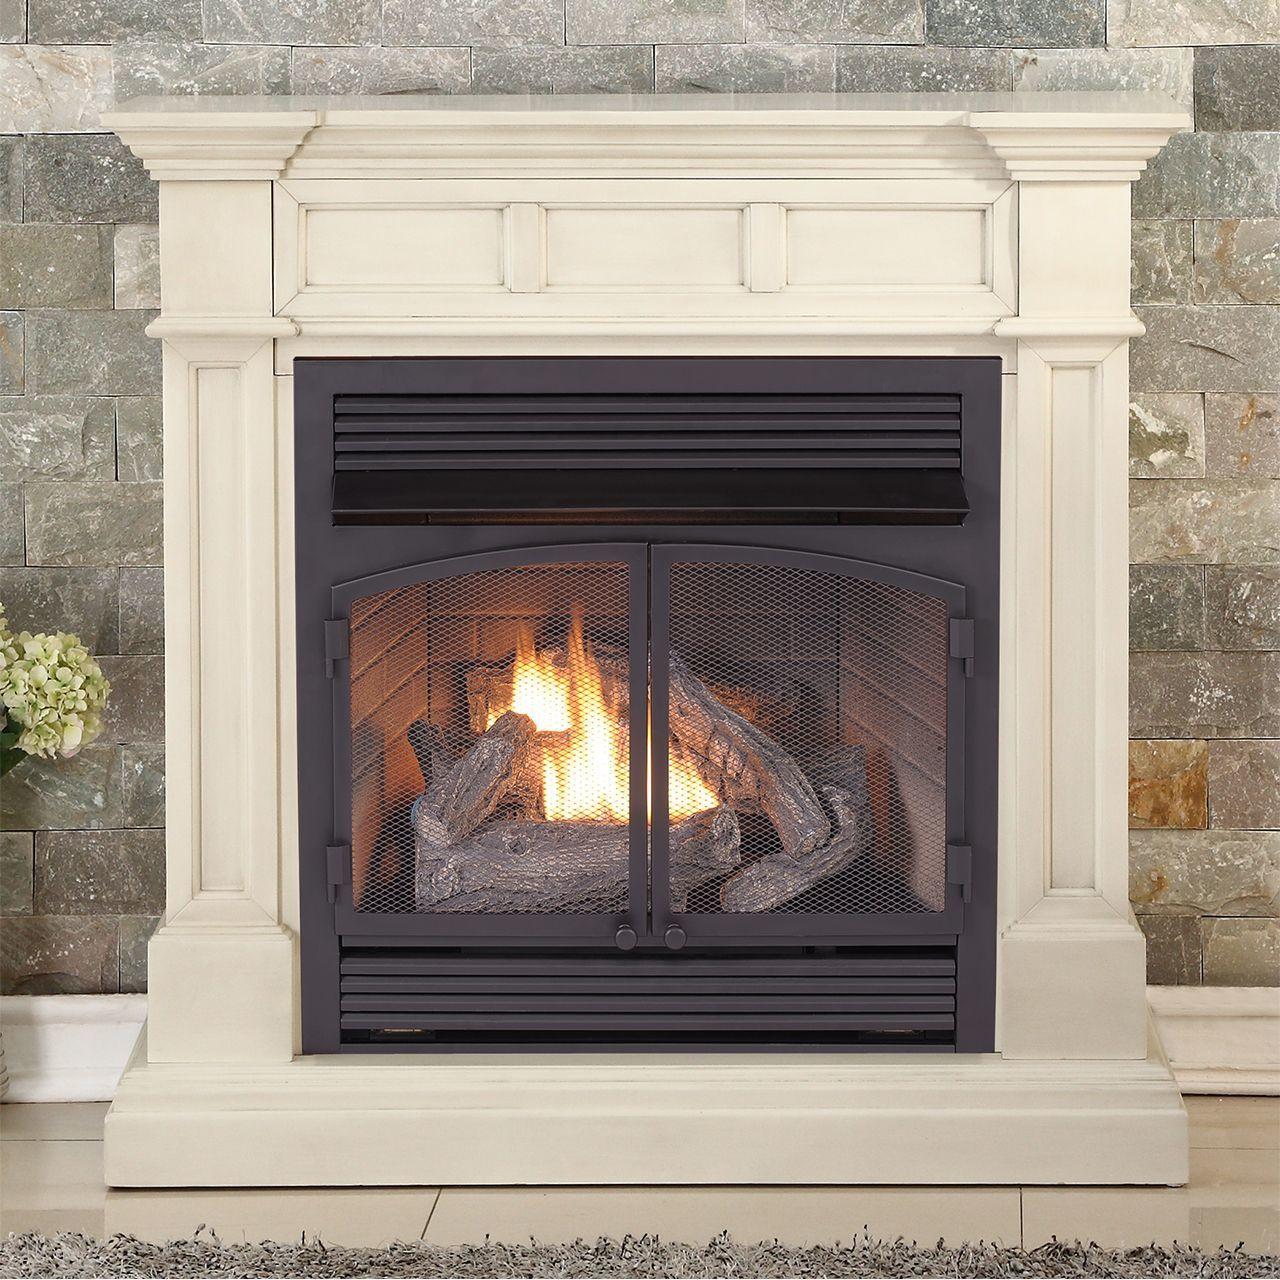 Best ideas about Ventless Gas Fireplace Inserts . Save or Pin Ventless Gas Fireplace Insert Now.